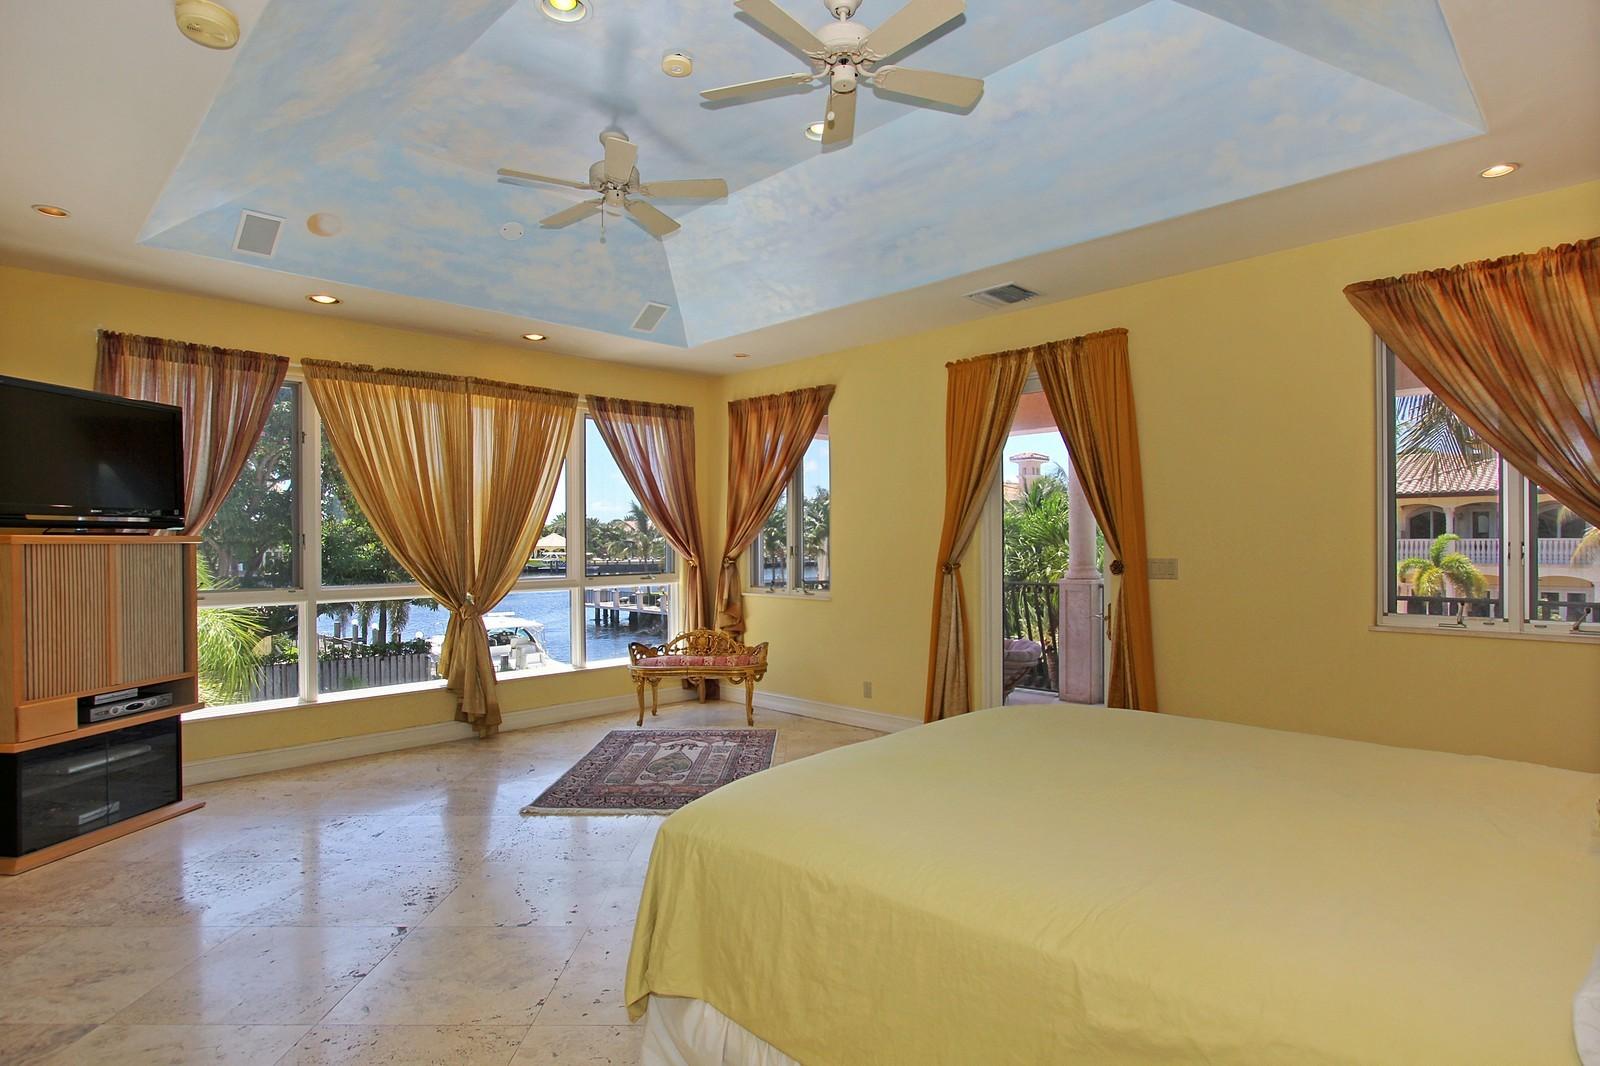 Real Estate Photography - 3310 NE 58th St, Fort Lauderdale, FL, 33308 - Master Bedroom